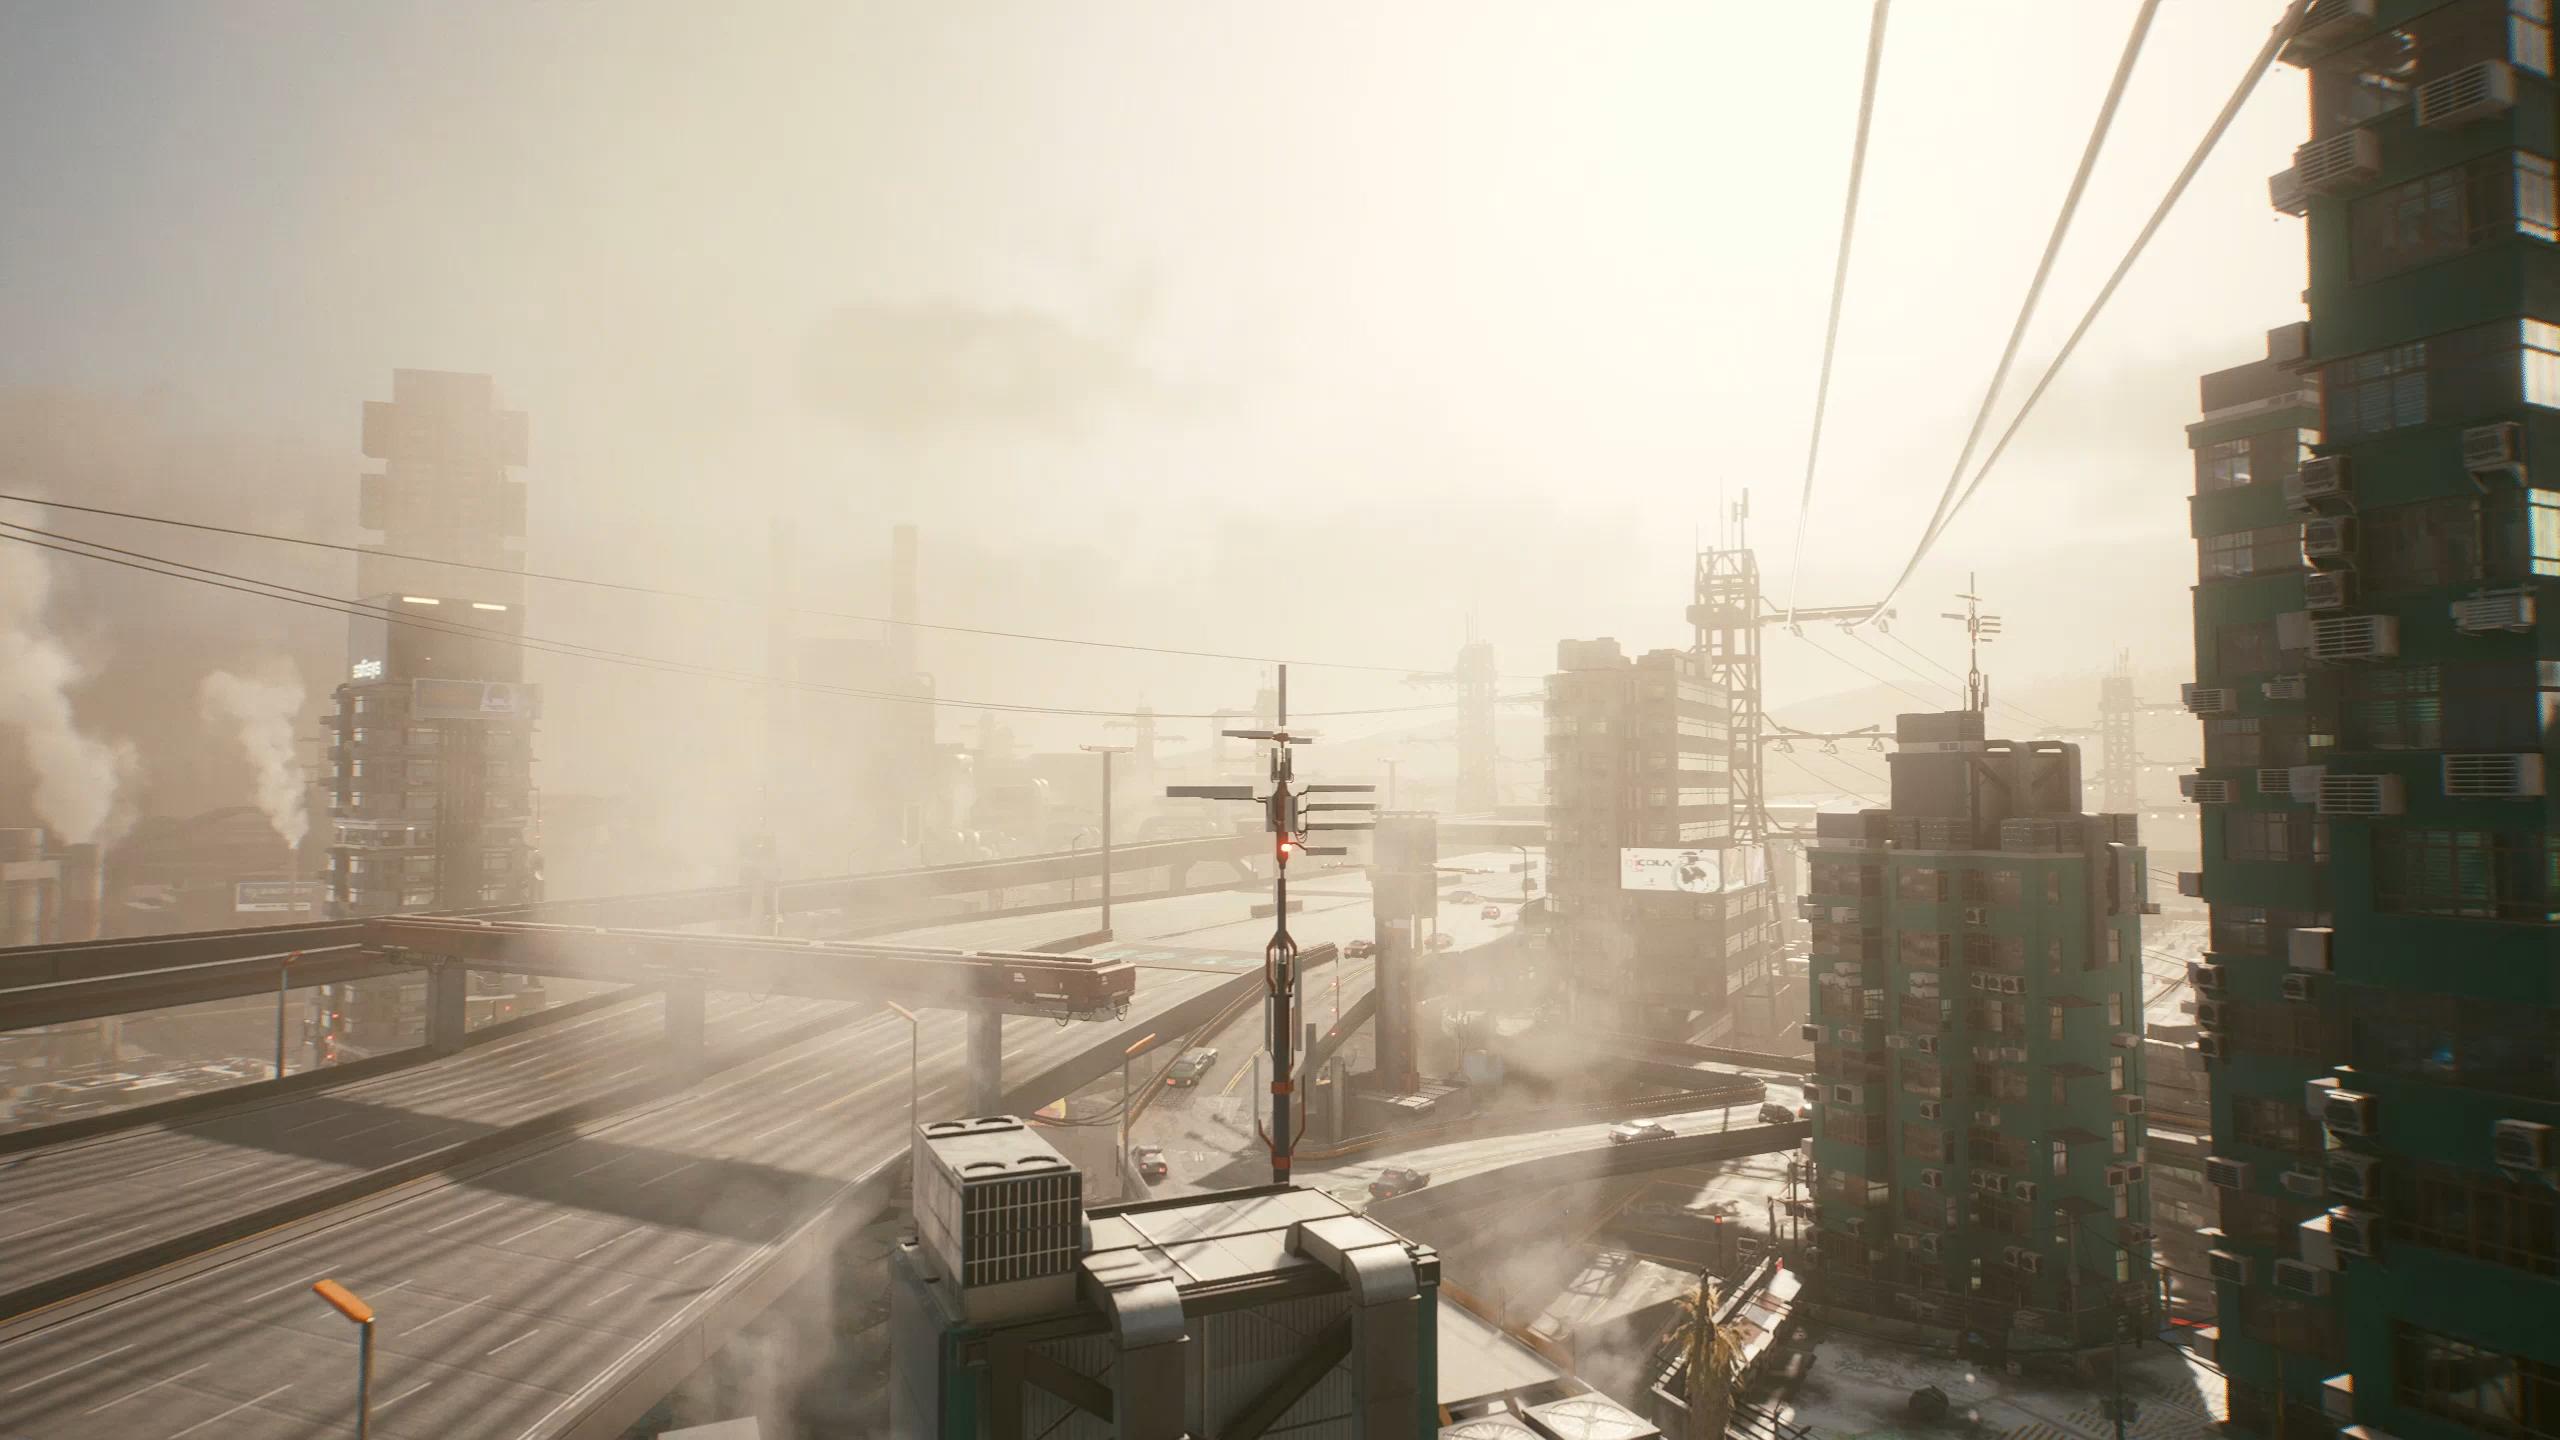 Для Cyberpunk 2077 вышел мод, позволяющий менять погоду